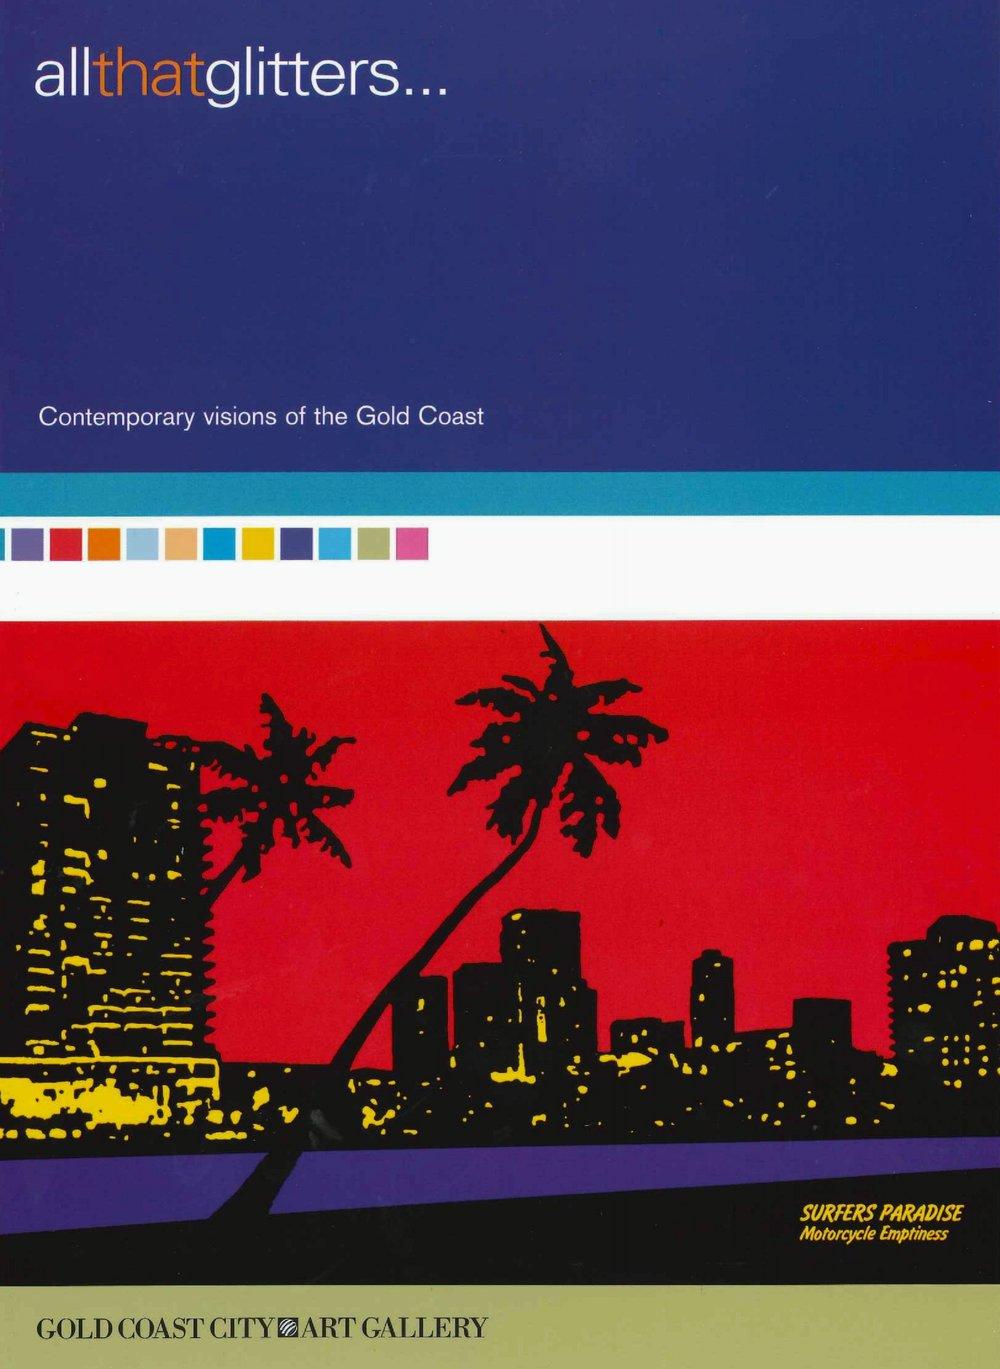 catalogue-all_that_glitters-gccg-2004_1.jpg